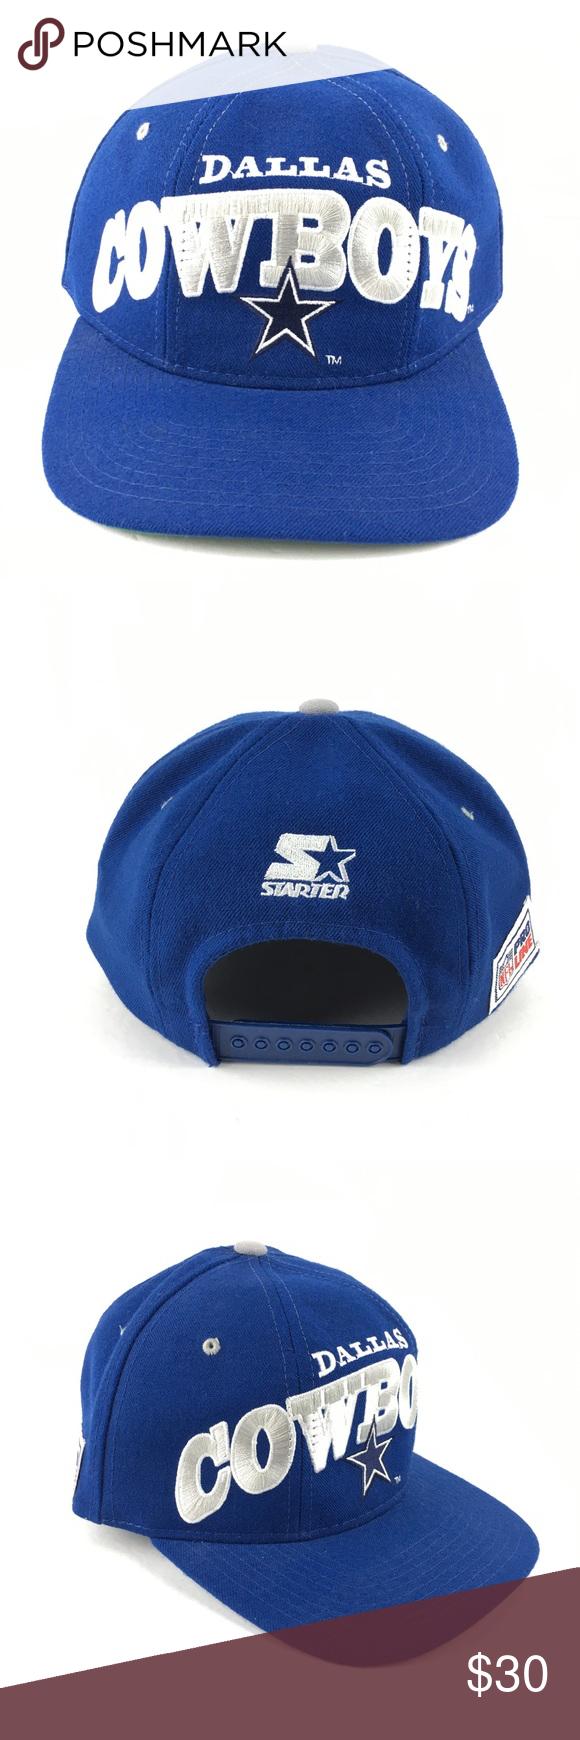 Vintage Dallas Cowboys Starter Hat Snapback Wool Vintage Dallas Cowboys  Starter Hat Cap Blue Grey Silver 679d24c1e95b